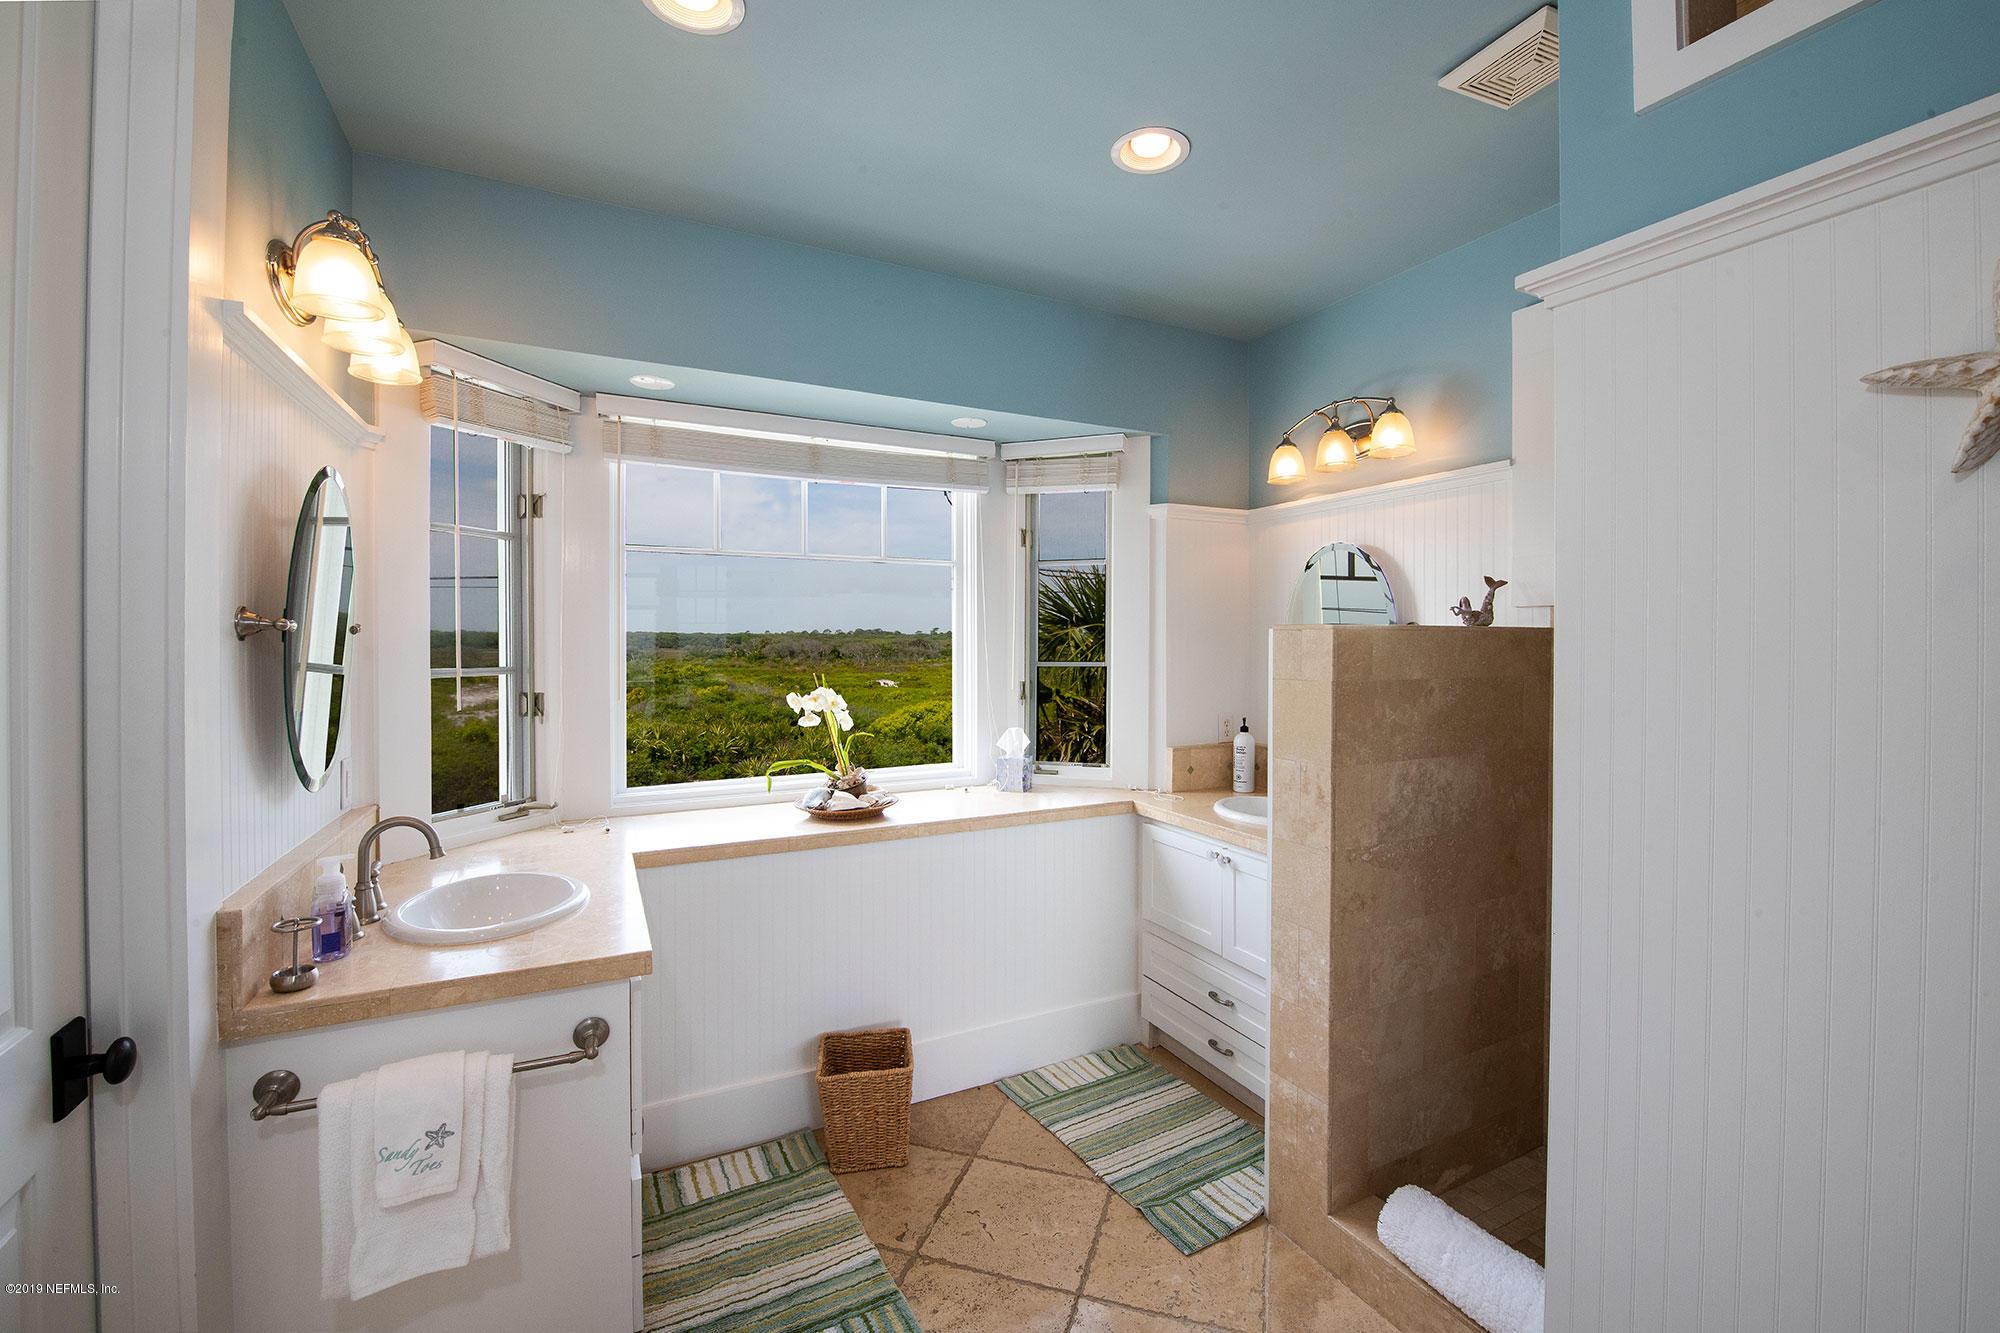 2903 PONTE VEDRA, PONTE VEDRA BEACH, FLORIDA 32082, 4 Bedrooms Bedrooms, ,3 BathroomsBathrooms,Residential - single family,For sale,PONTE VEDRA,993034